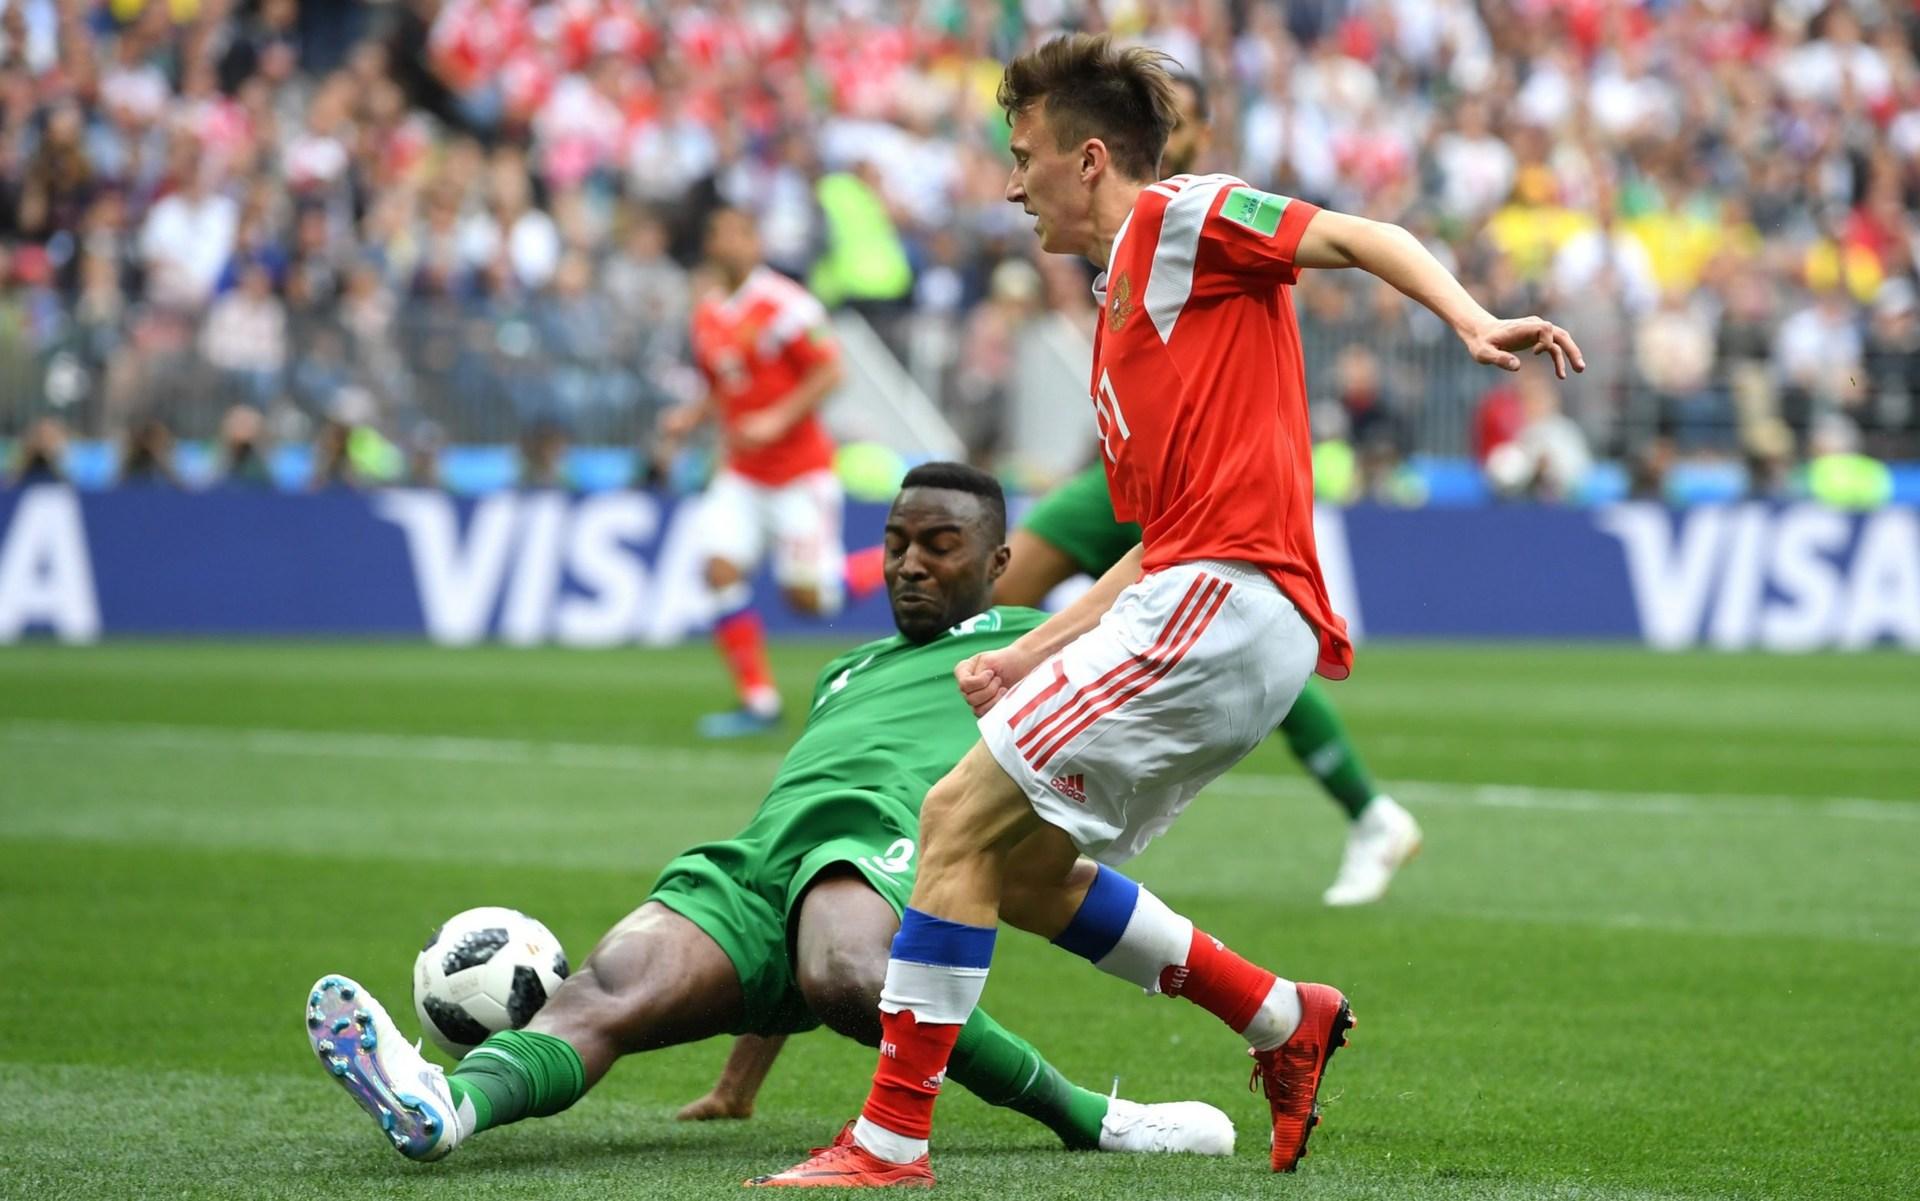 Russia 1-0 Saudi Arabia! Yury Gazinsky heads home the first goal of the World Cup